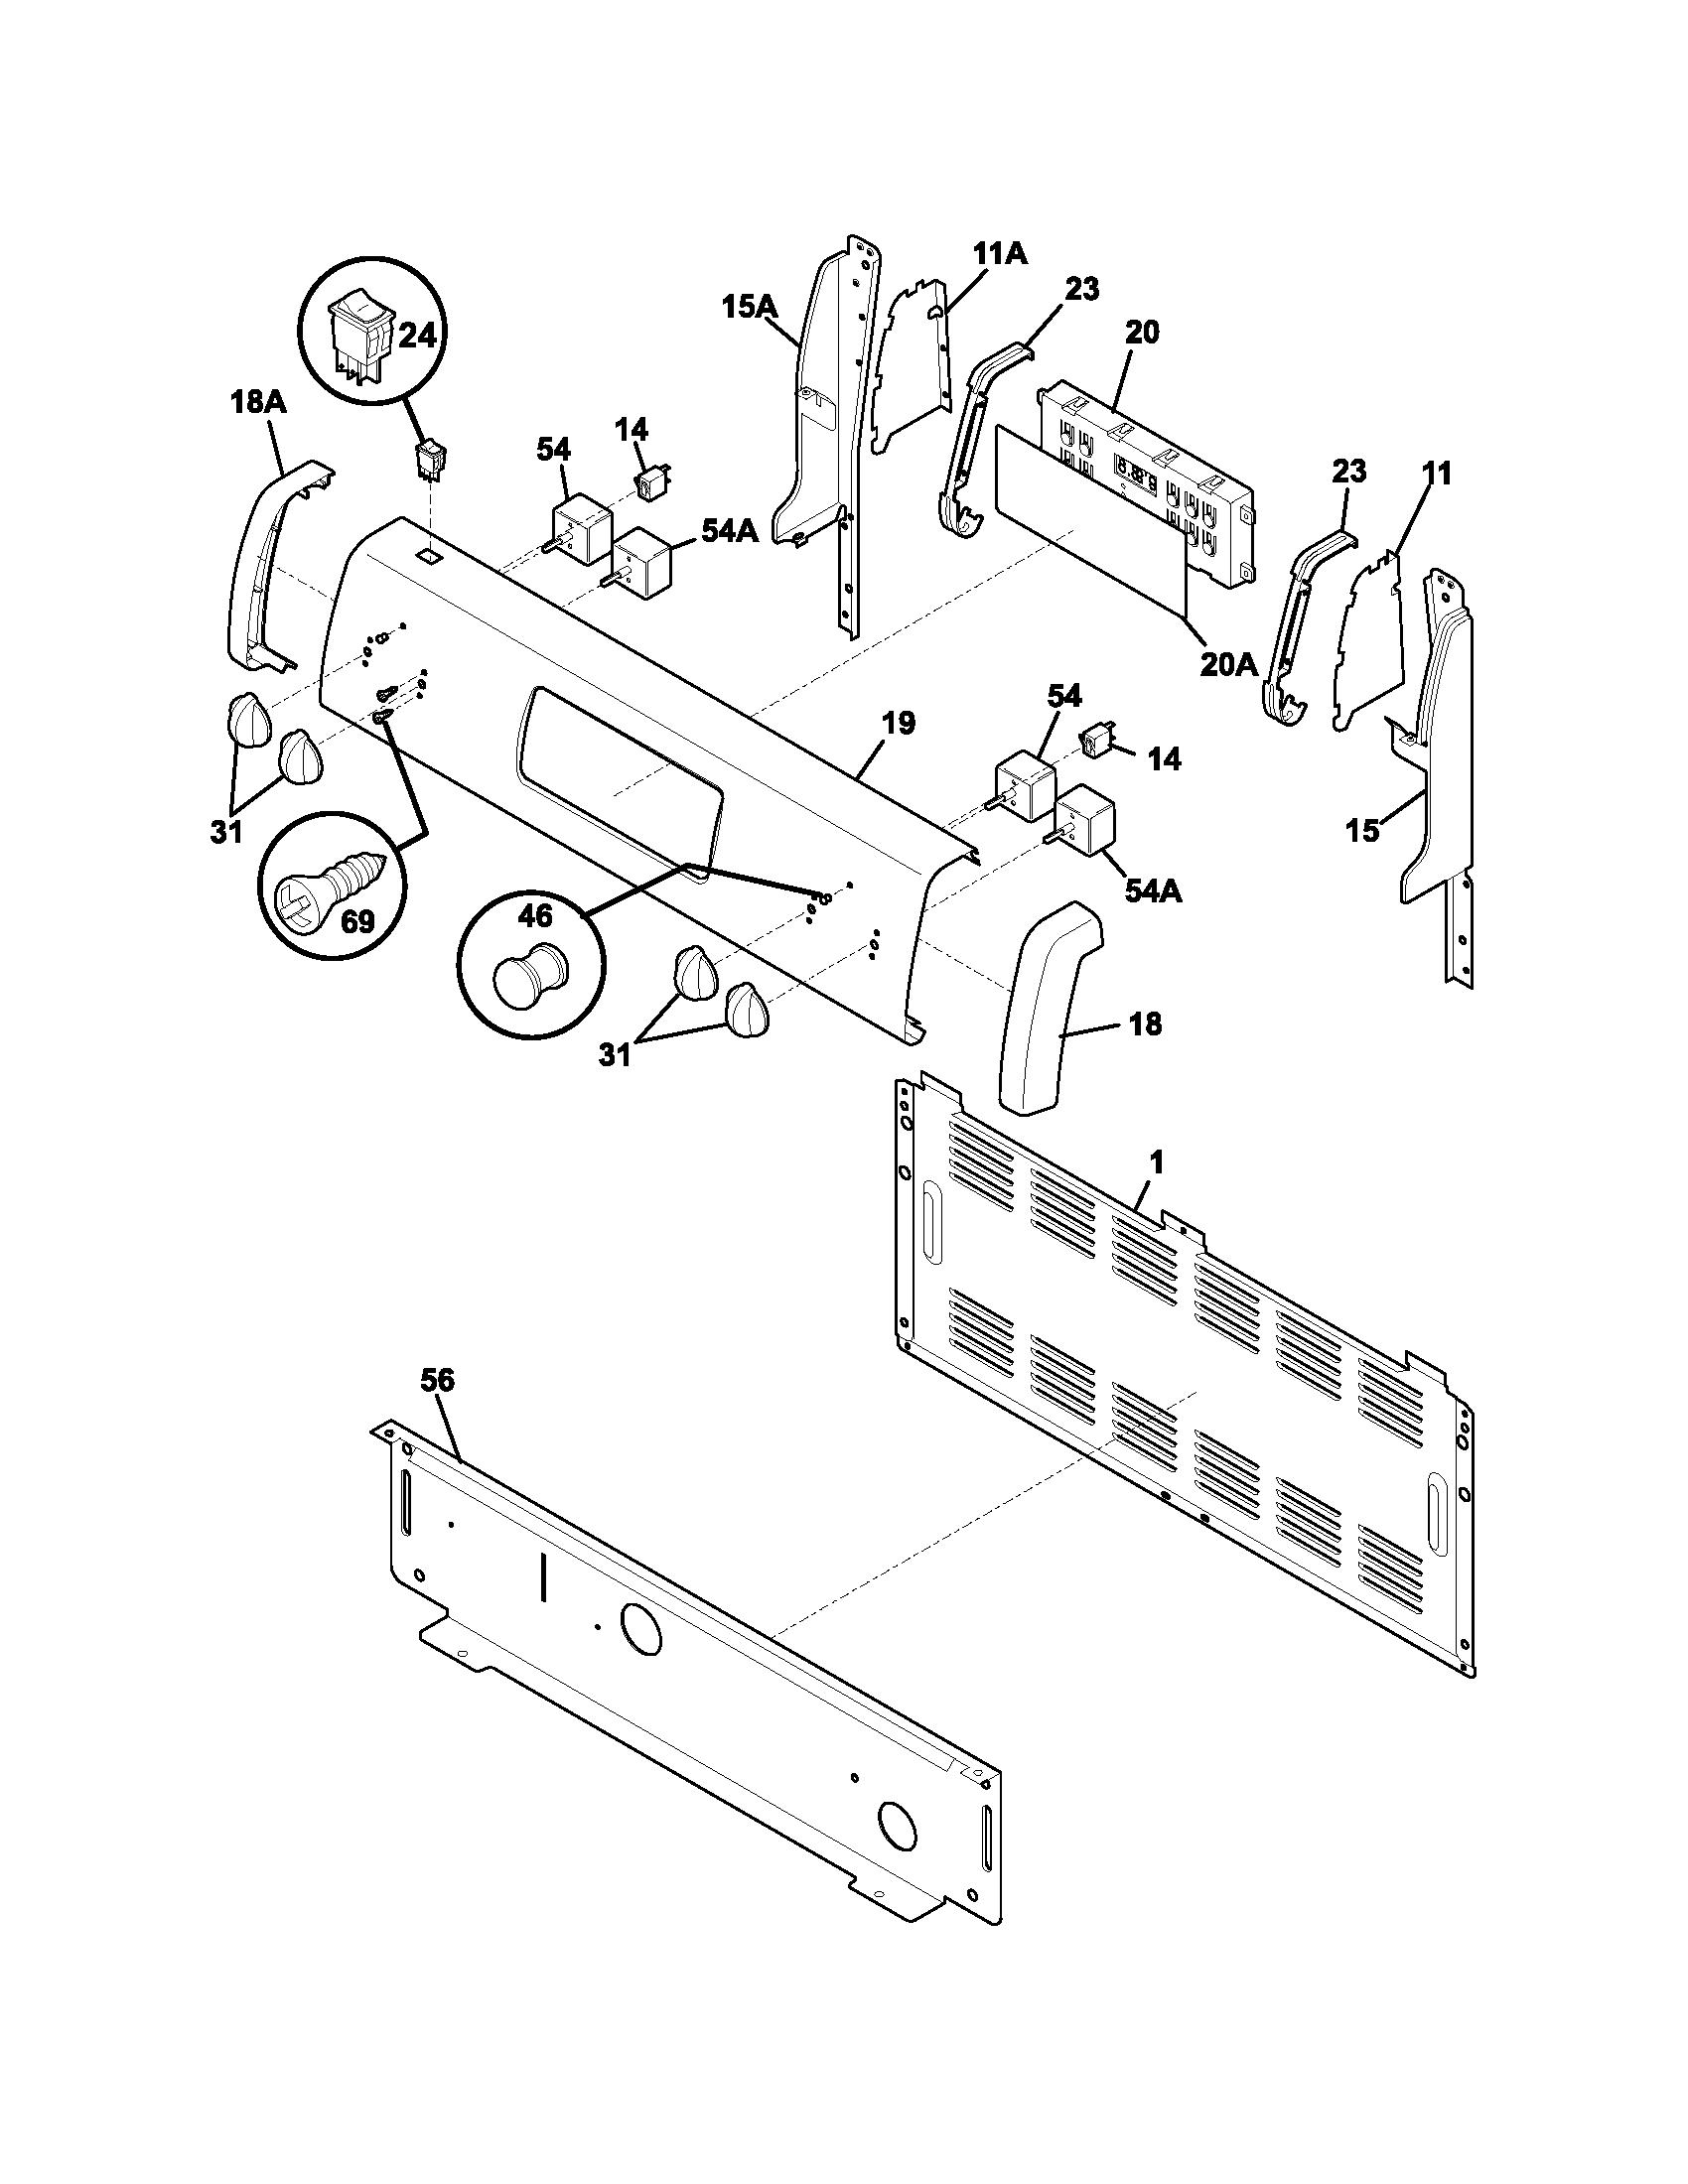 hight resolution of fef352aug electric range backguard parts diagram